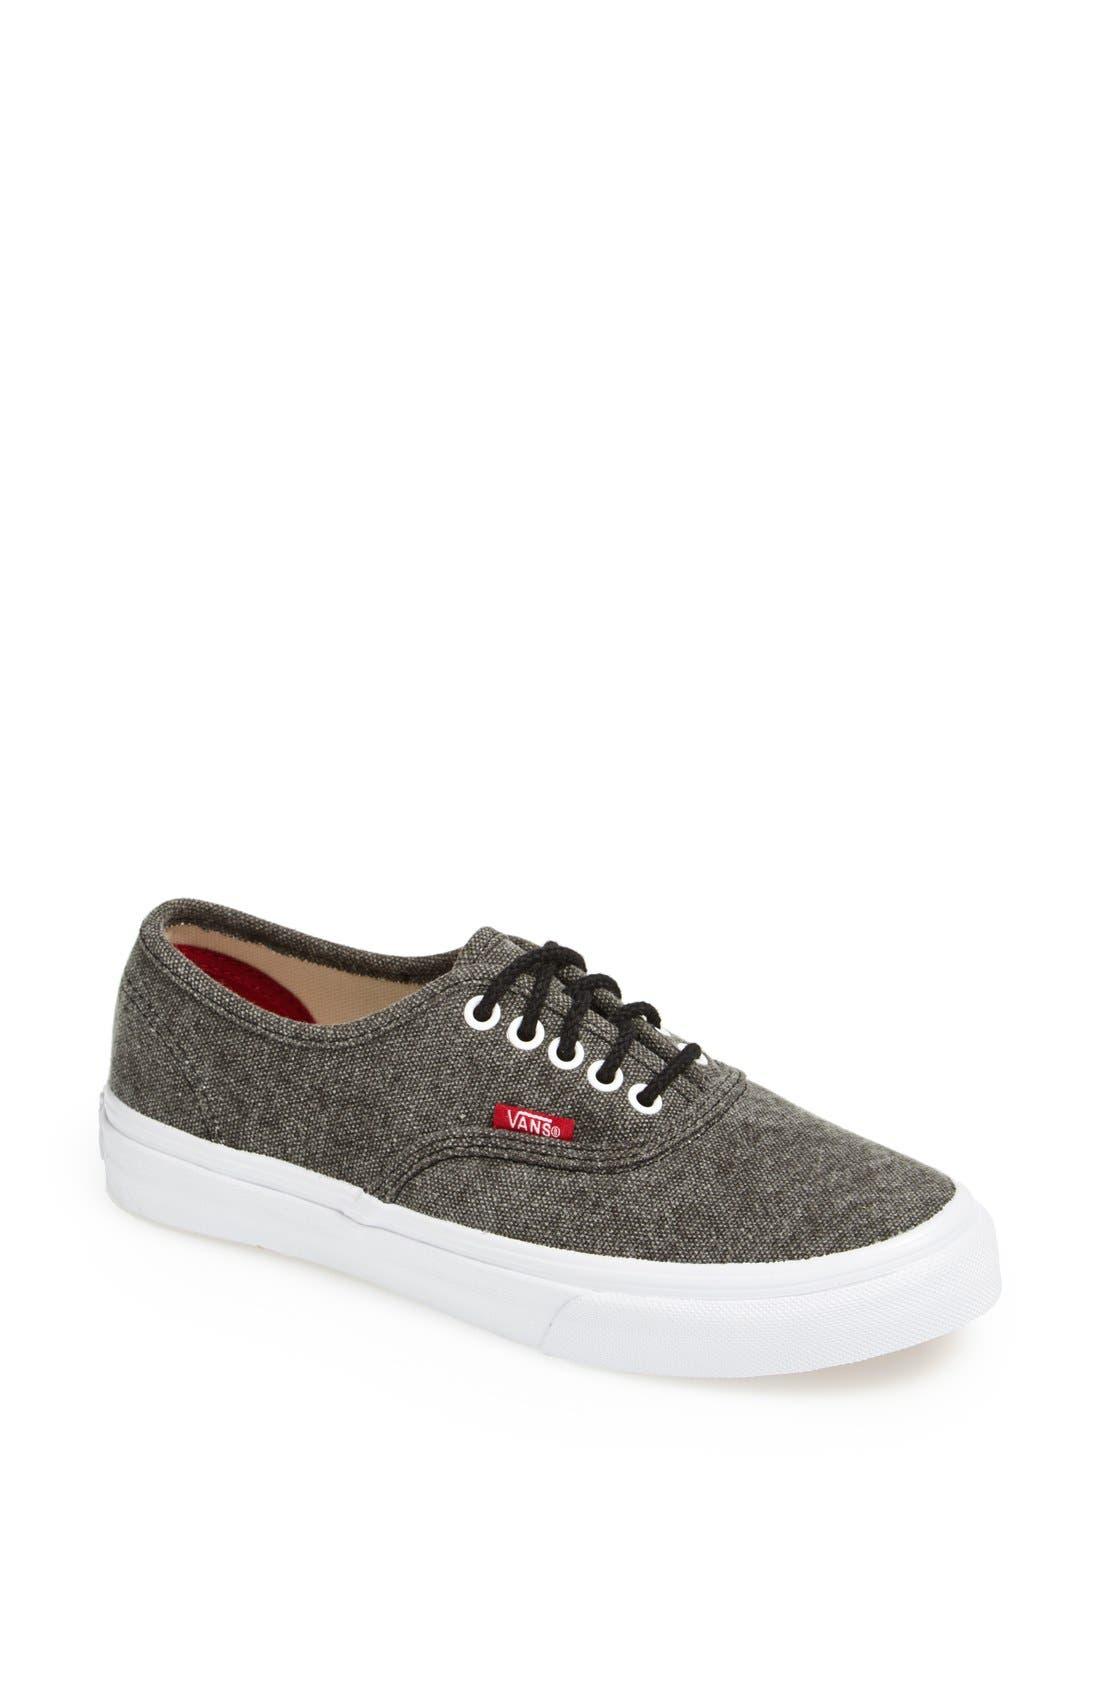 Main Image - Vans 'Authentic - Slim' Canvas Sneaker (Women)